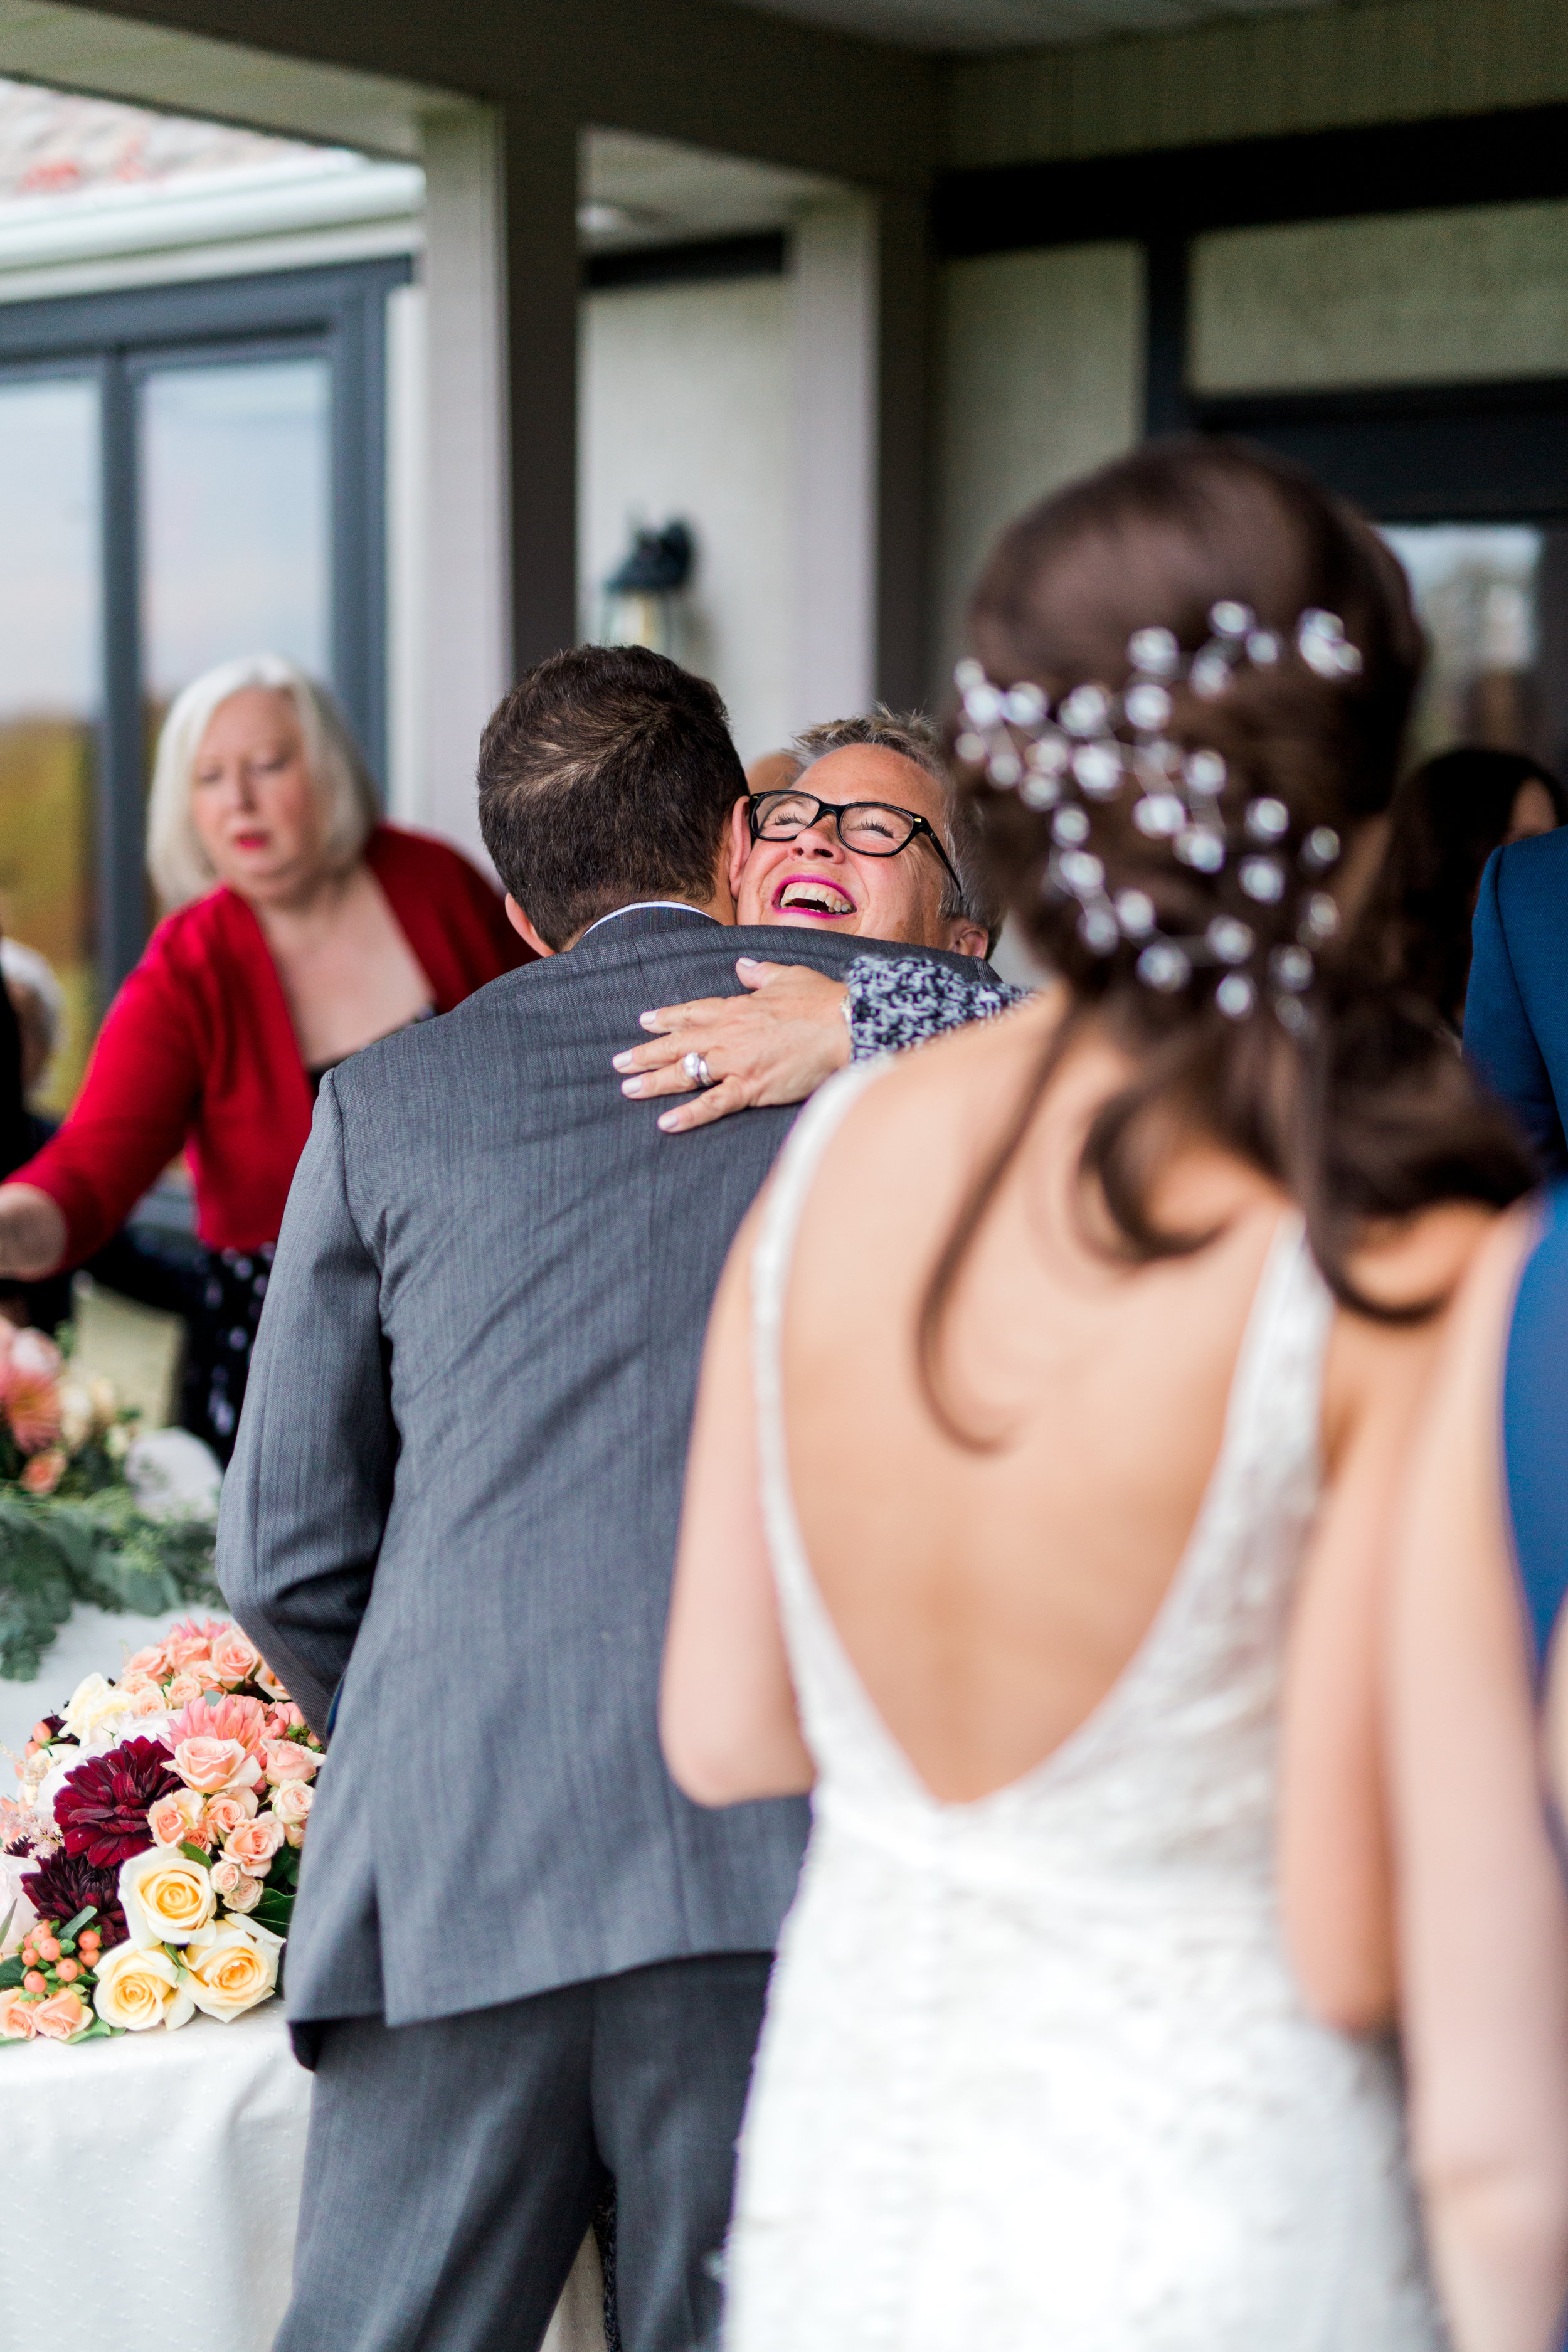 Amir-Golbazi-Danielle-Giroux-Photography_Toronto-Wedding_Cedarwood_Rachel-Paul_283.jpg